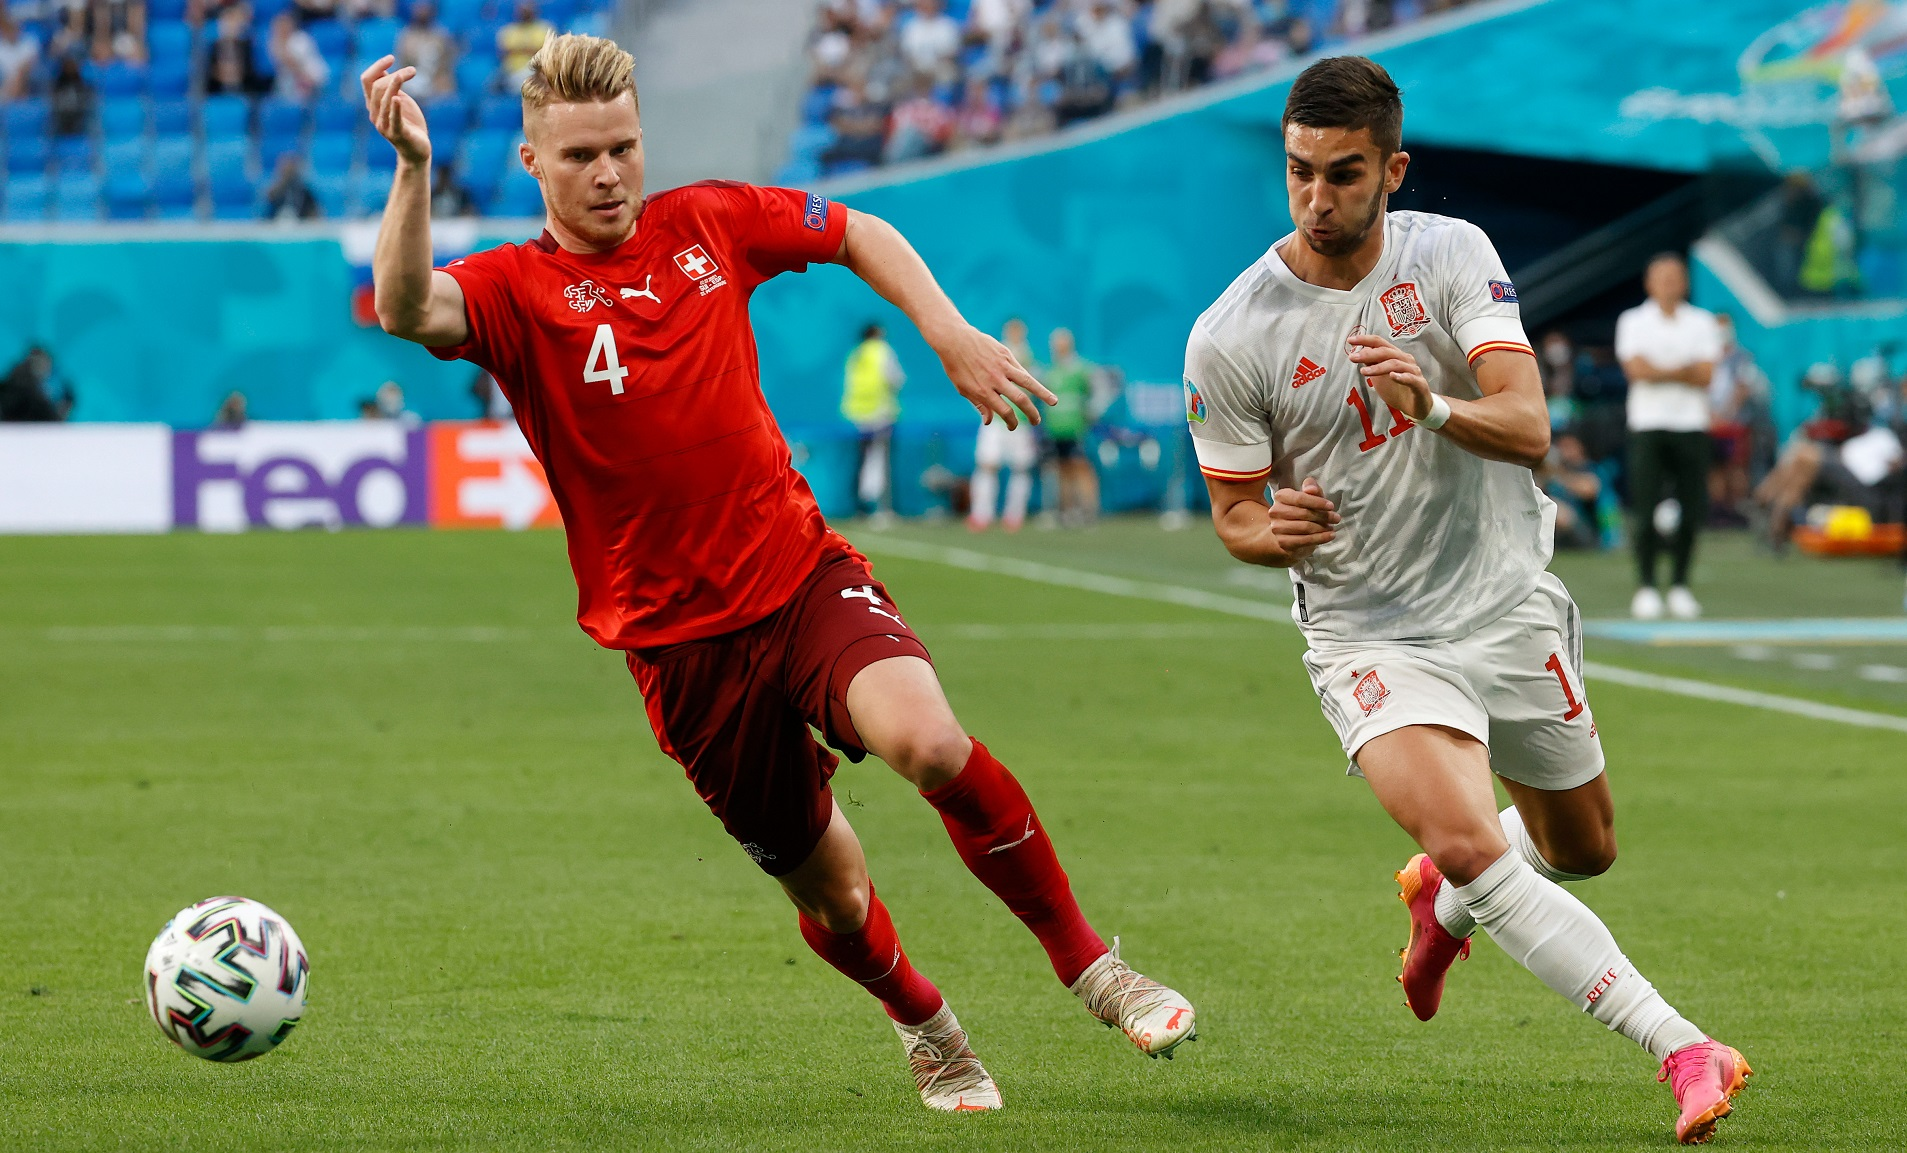 WING COMMAND: Ferran Torres in action during Spain's quarter-final win over Switzerland